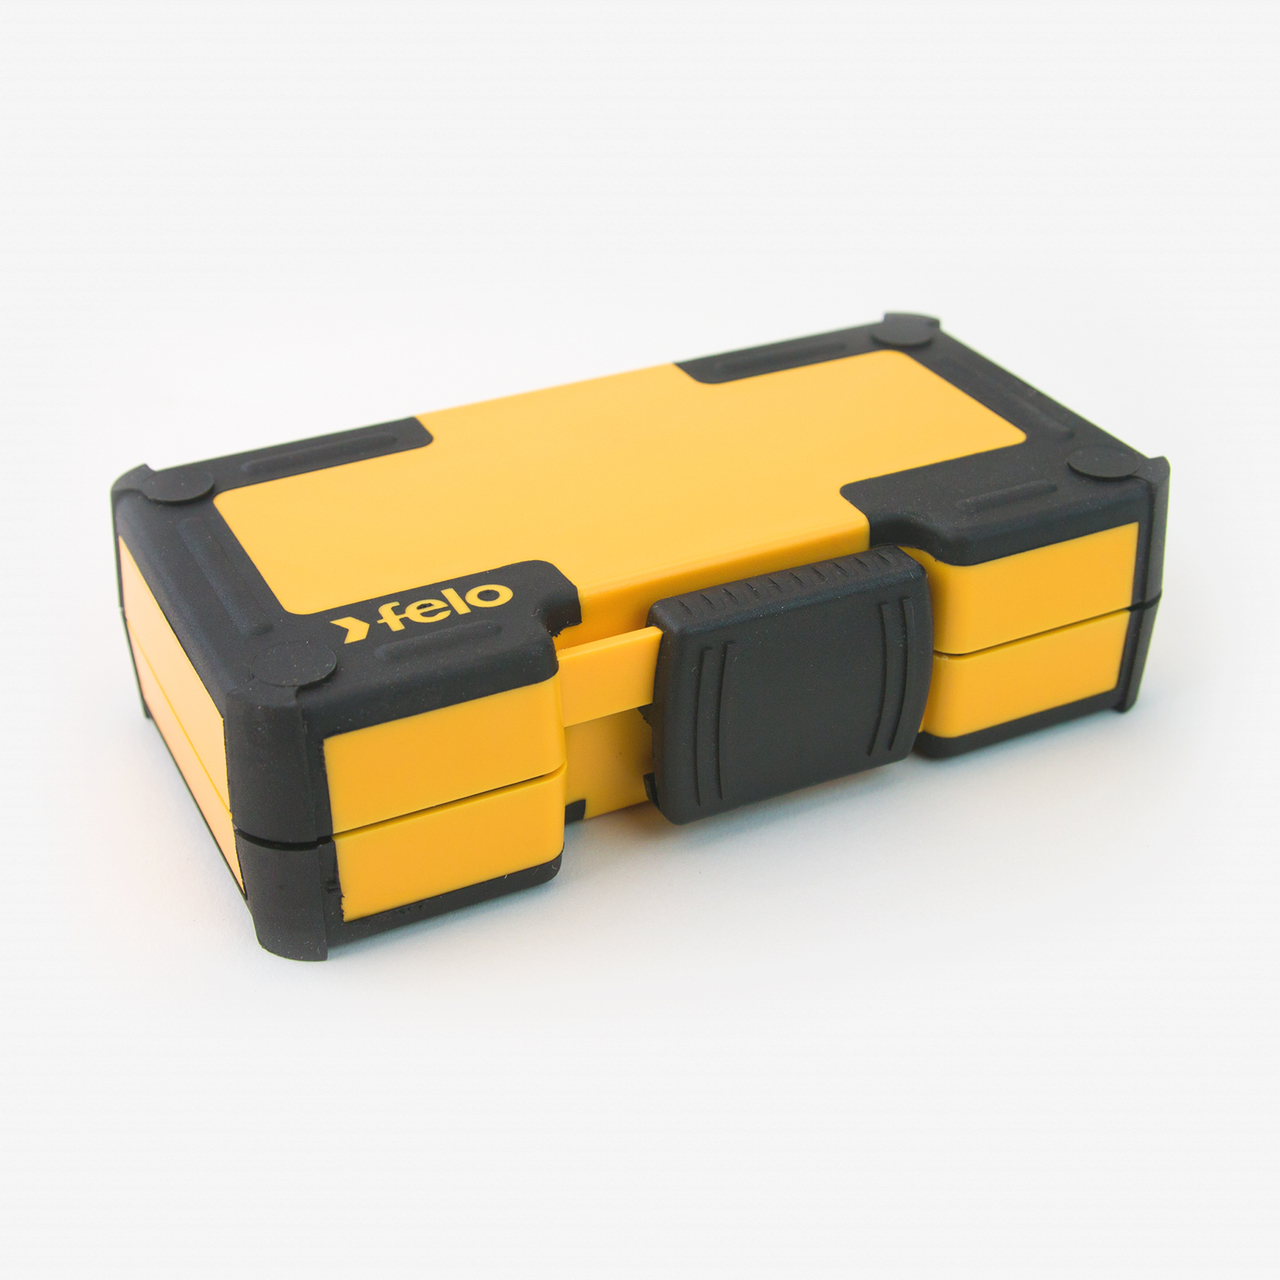 Felo 61563 30 Piece Insert Bit Set with Handle - KC Tool